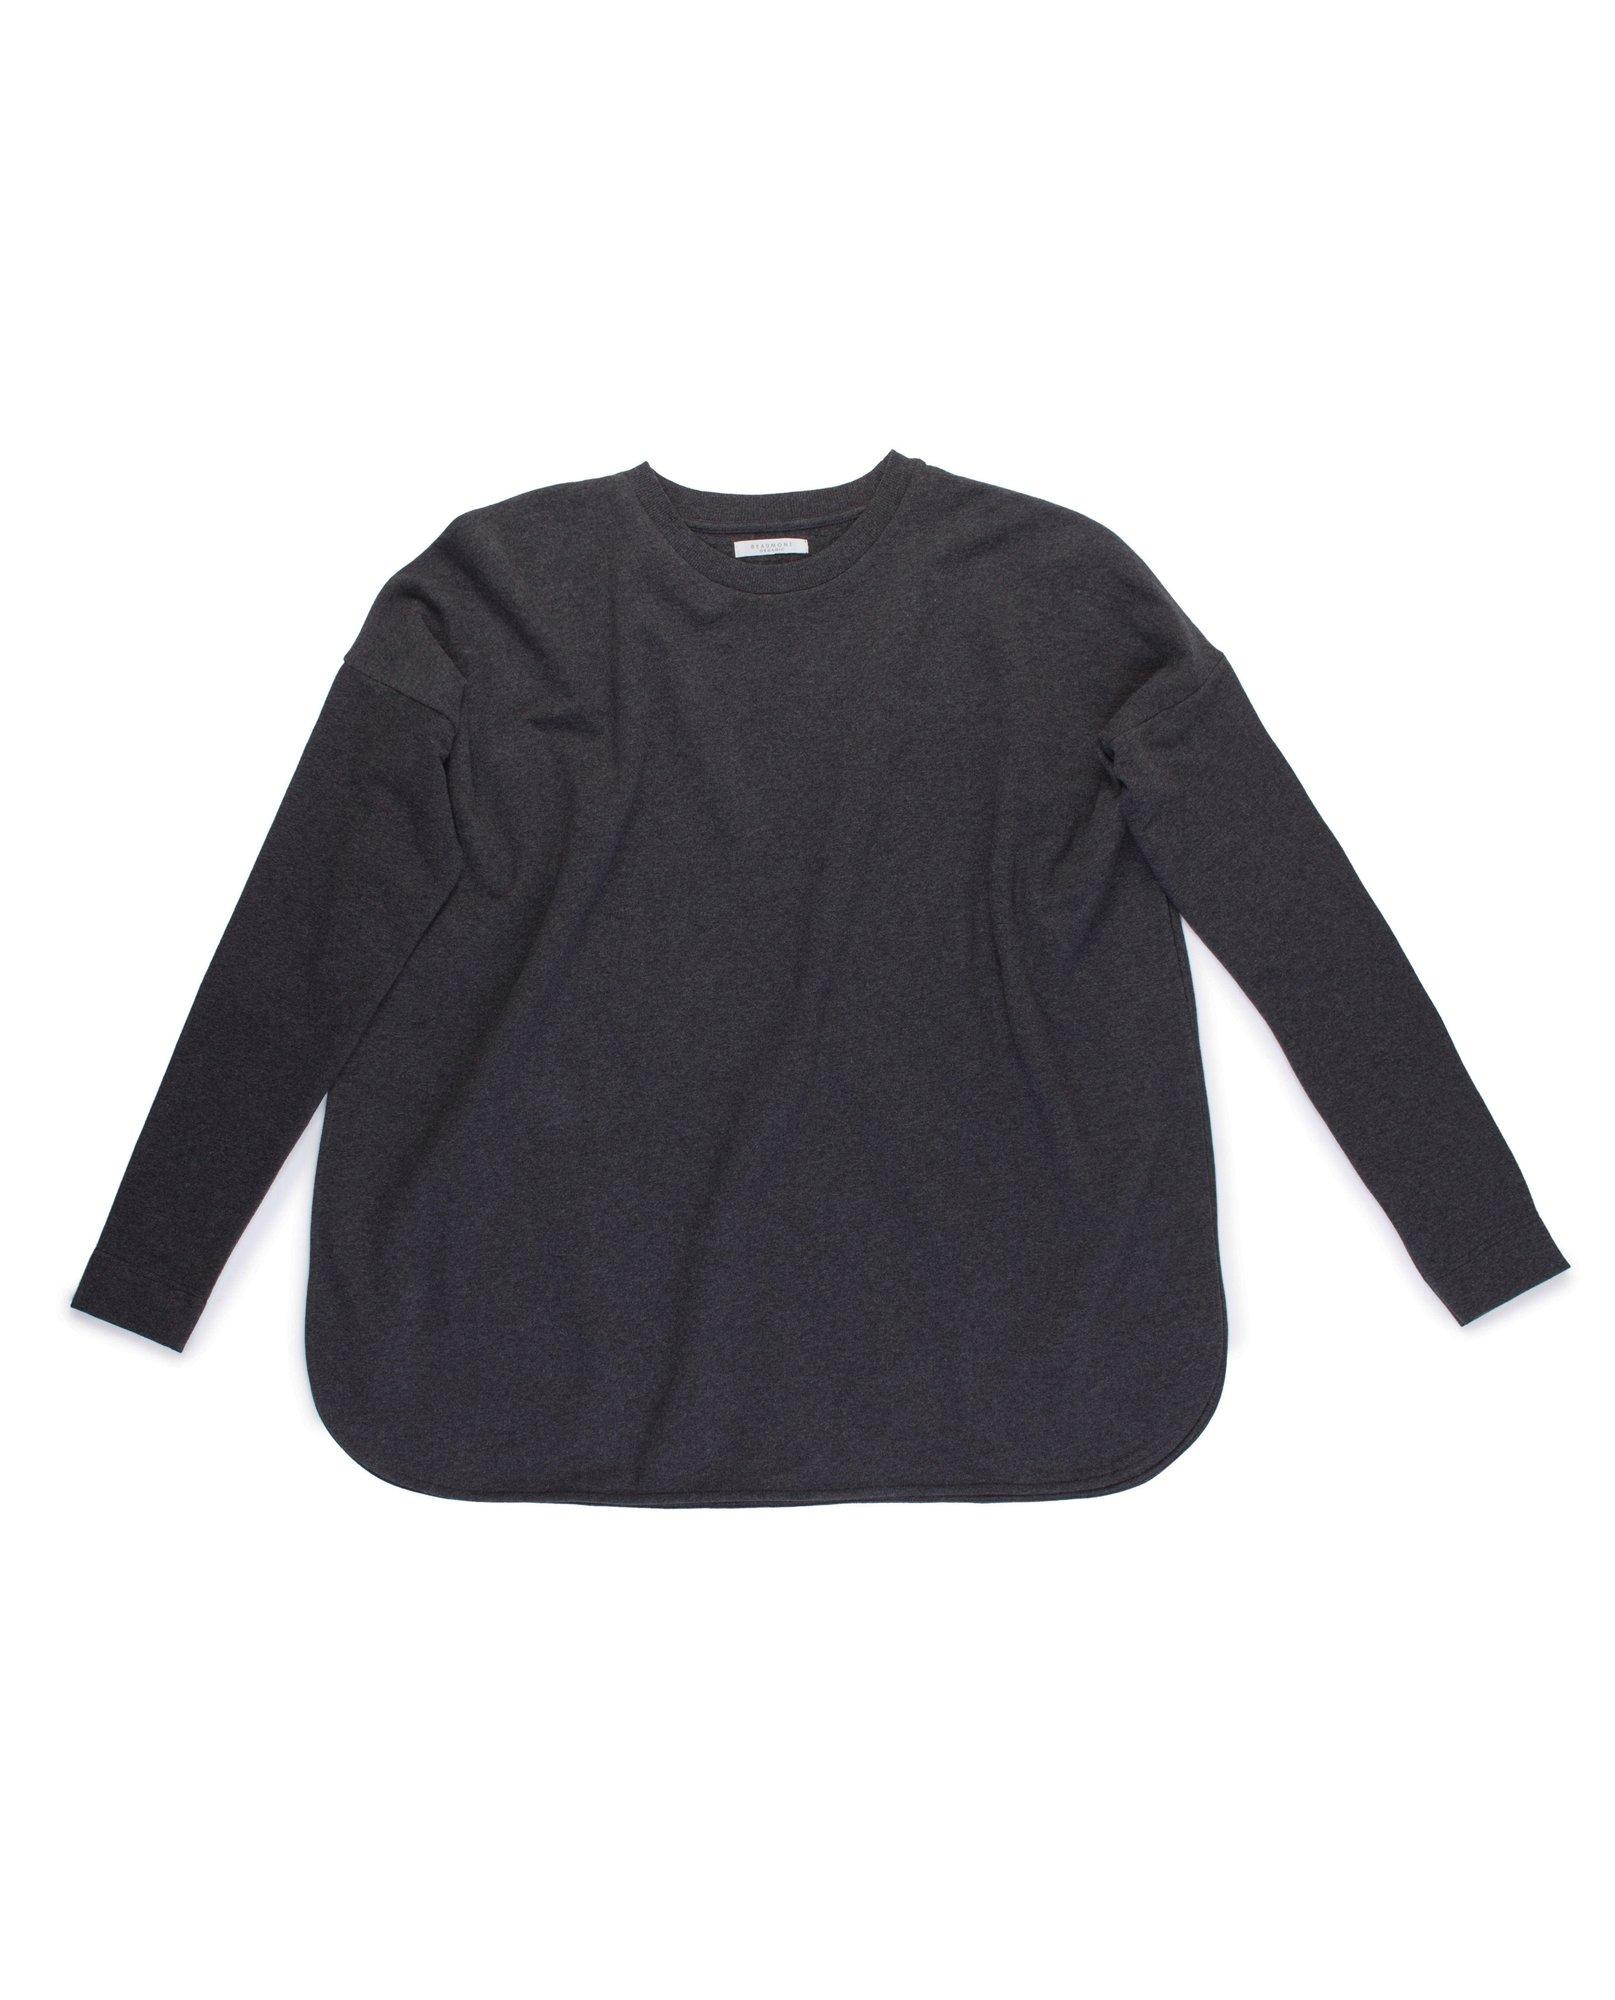 KATE Organic Cotton Sweatshirt In Dark Grey from Beaumont Organic